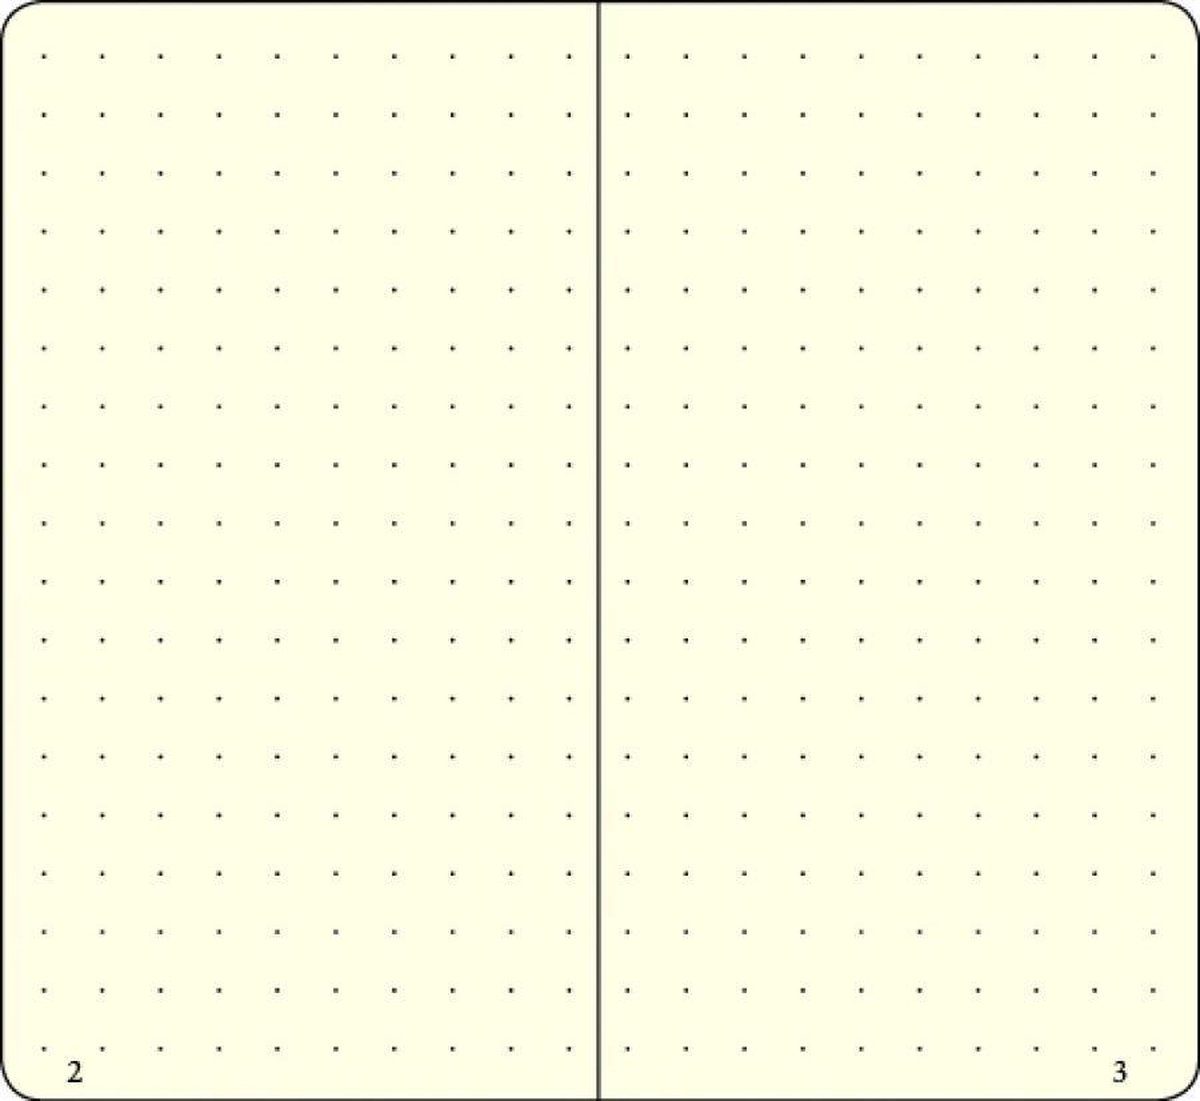 Lt346695,Leuchtturm notitieboek medium 145x210 puntjes/dots  azuurblauw